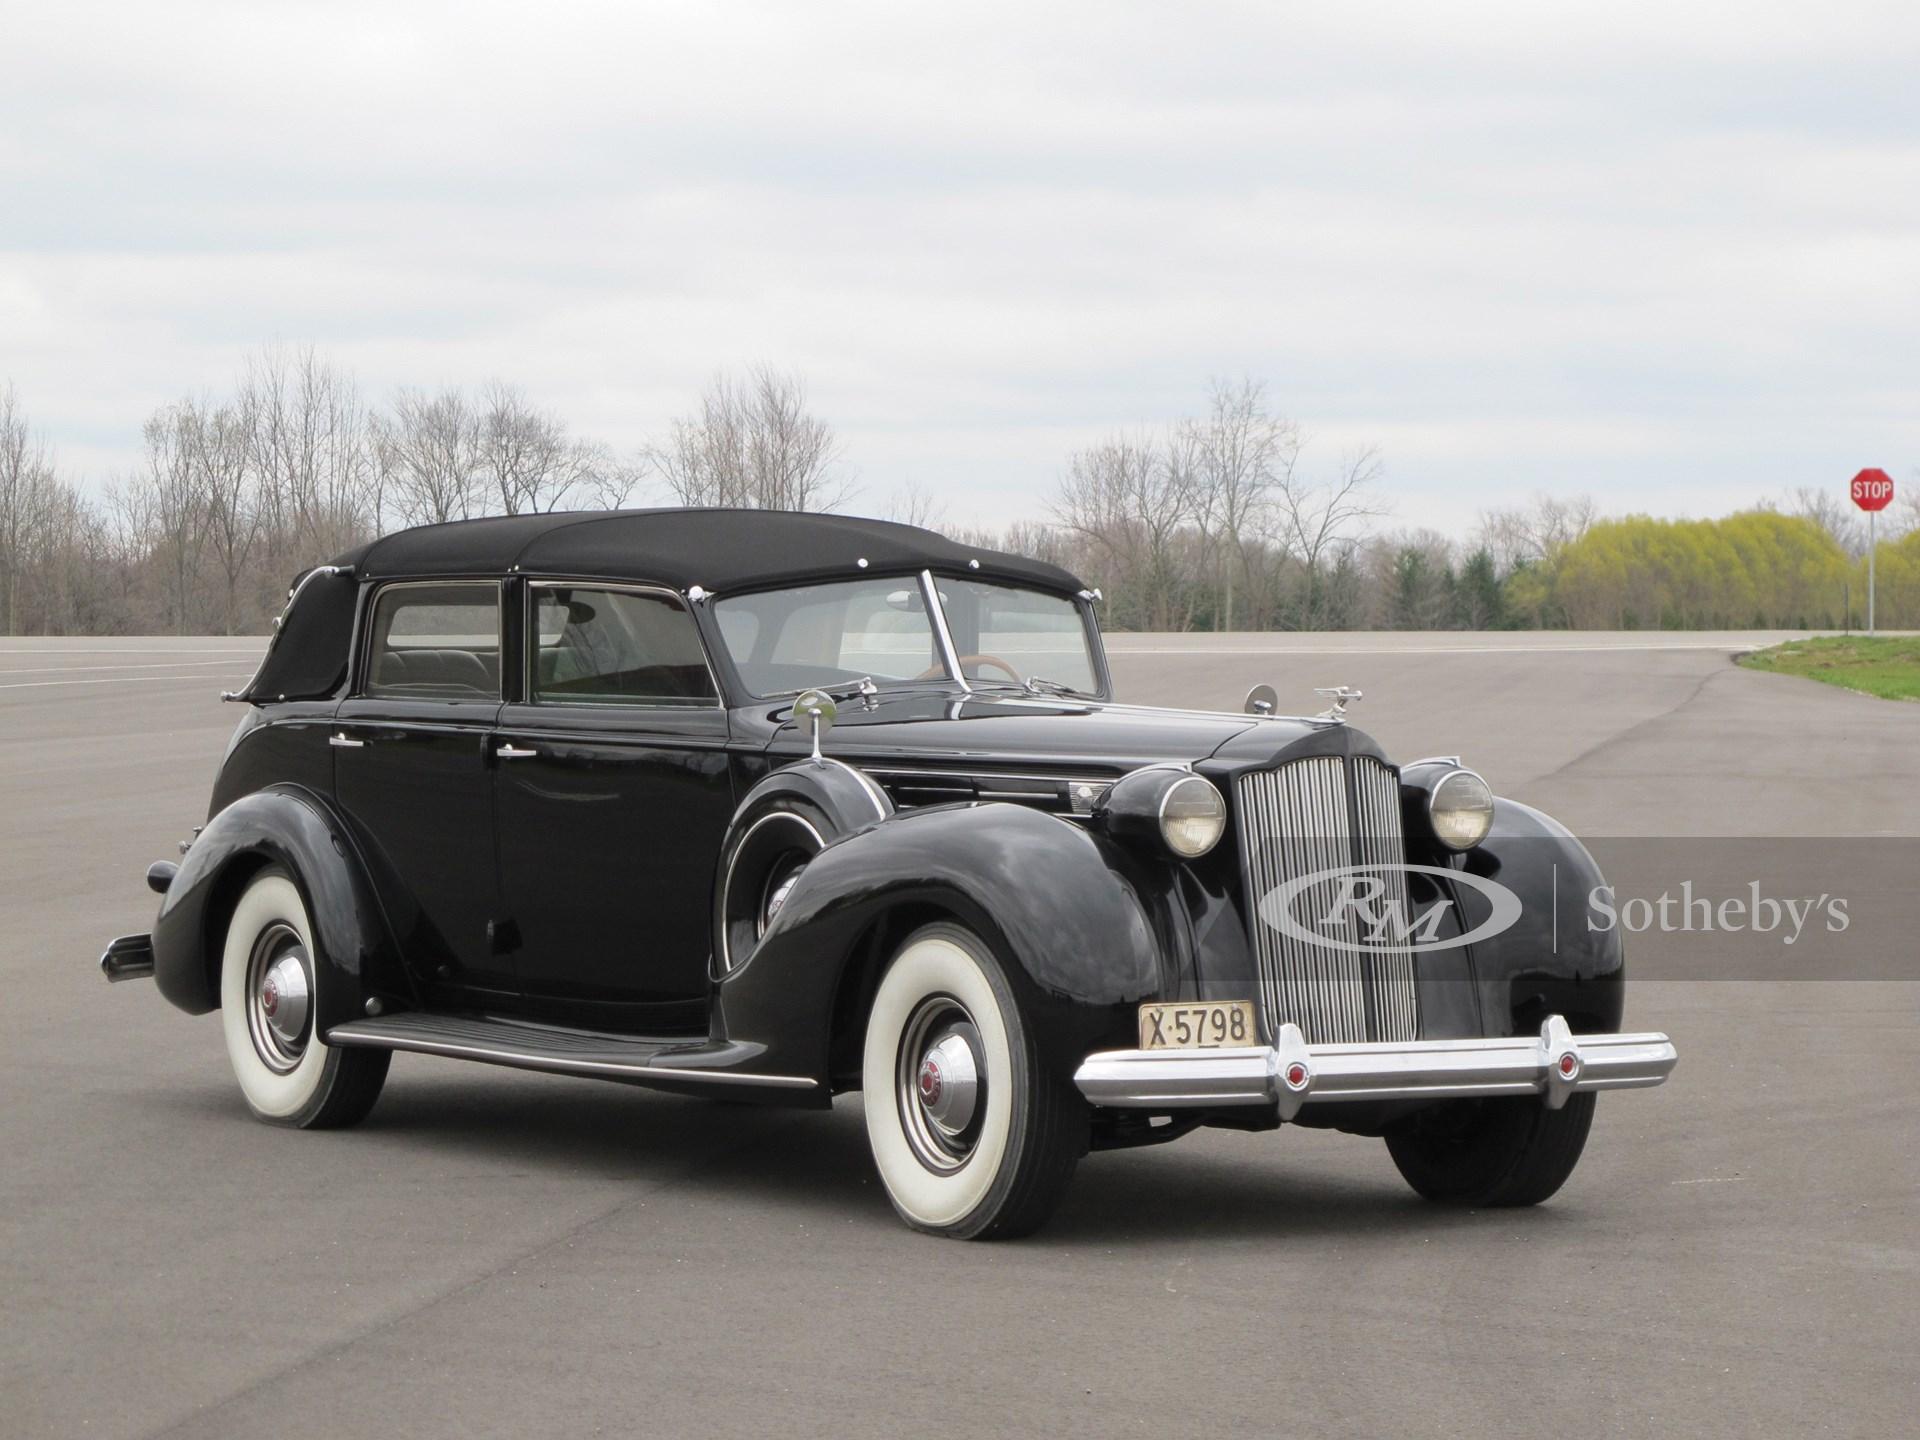 1938 Packard Twelve All-Weather Cabriolet